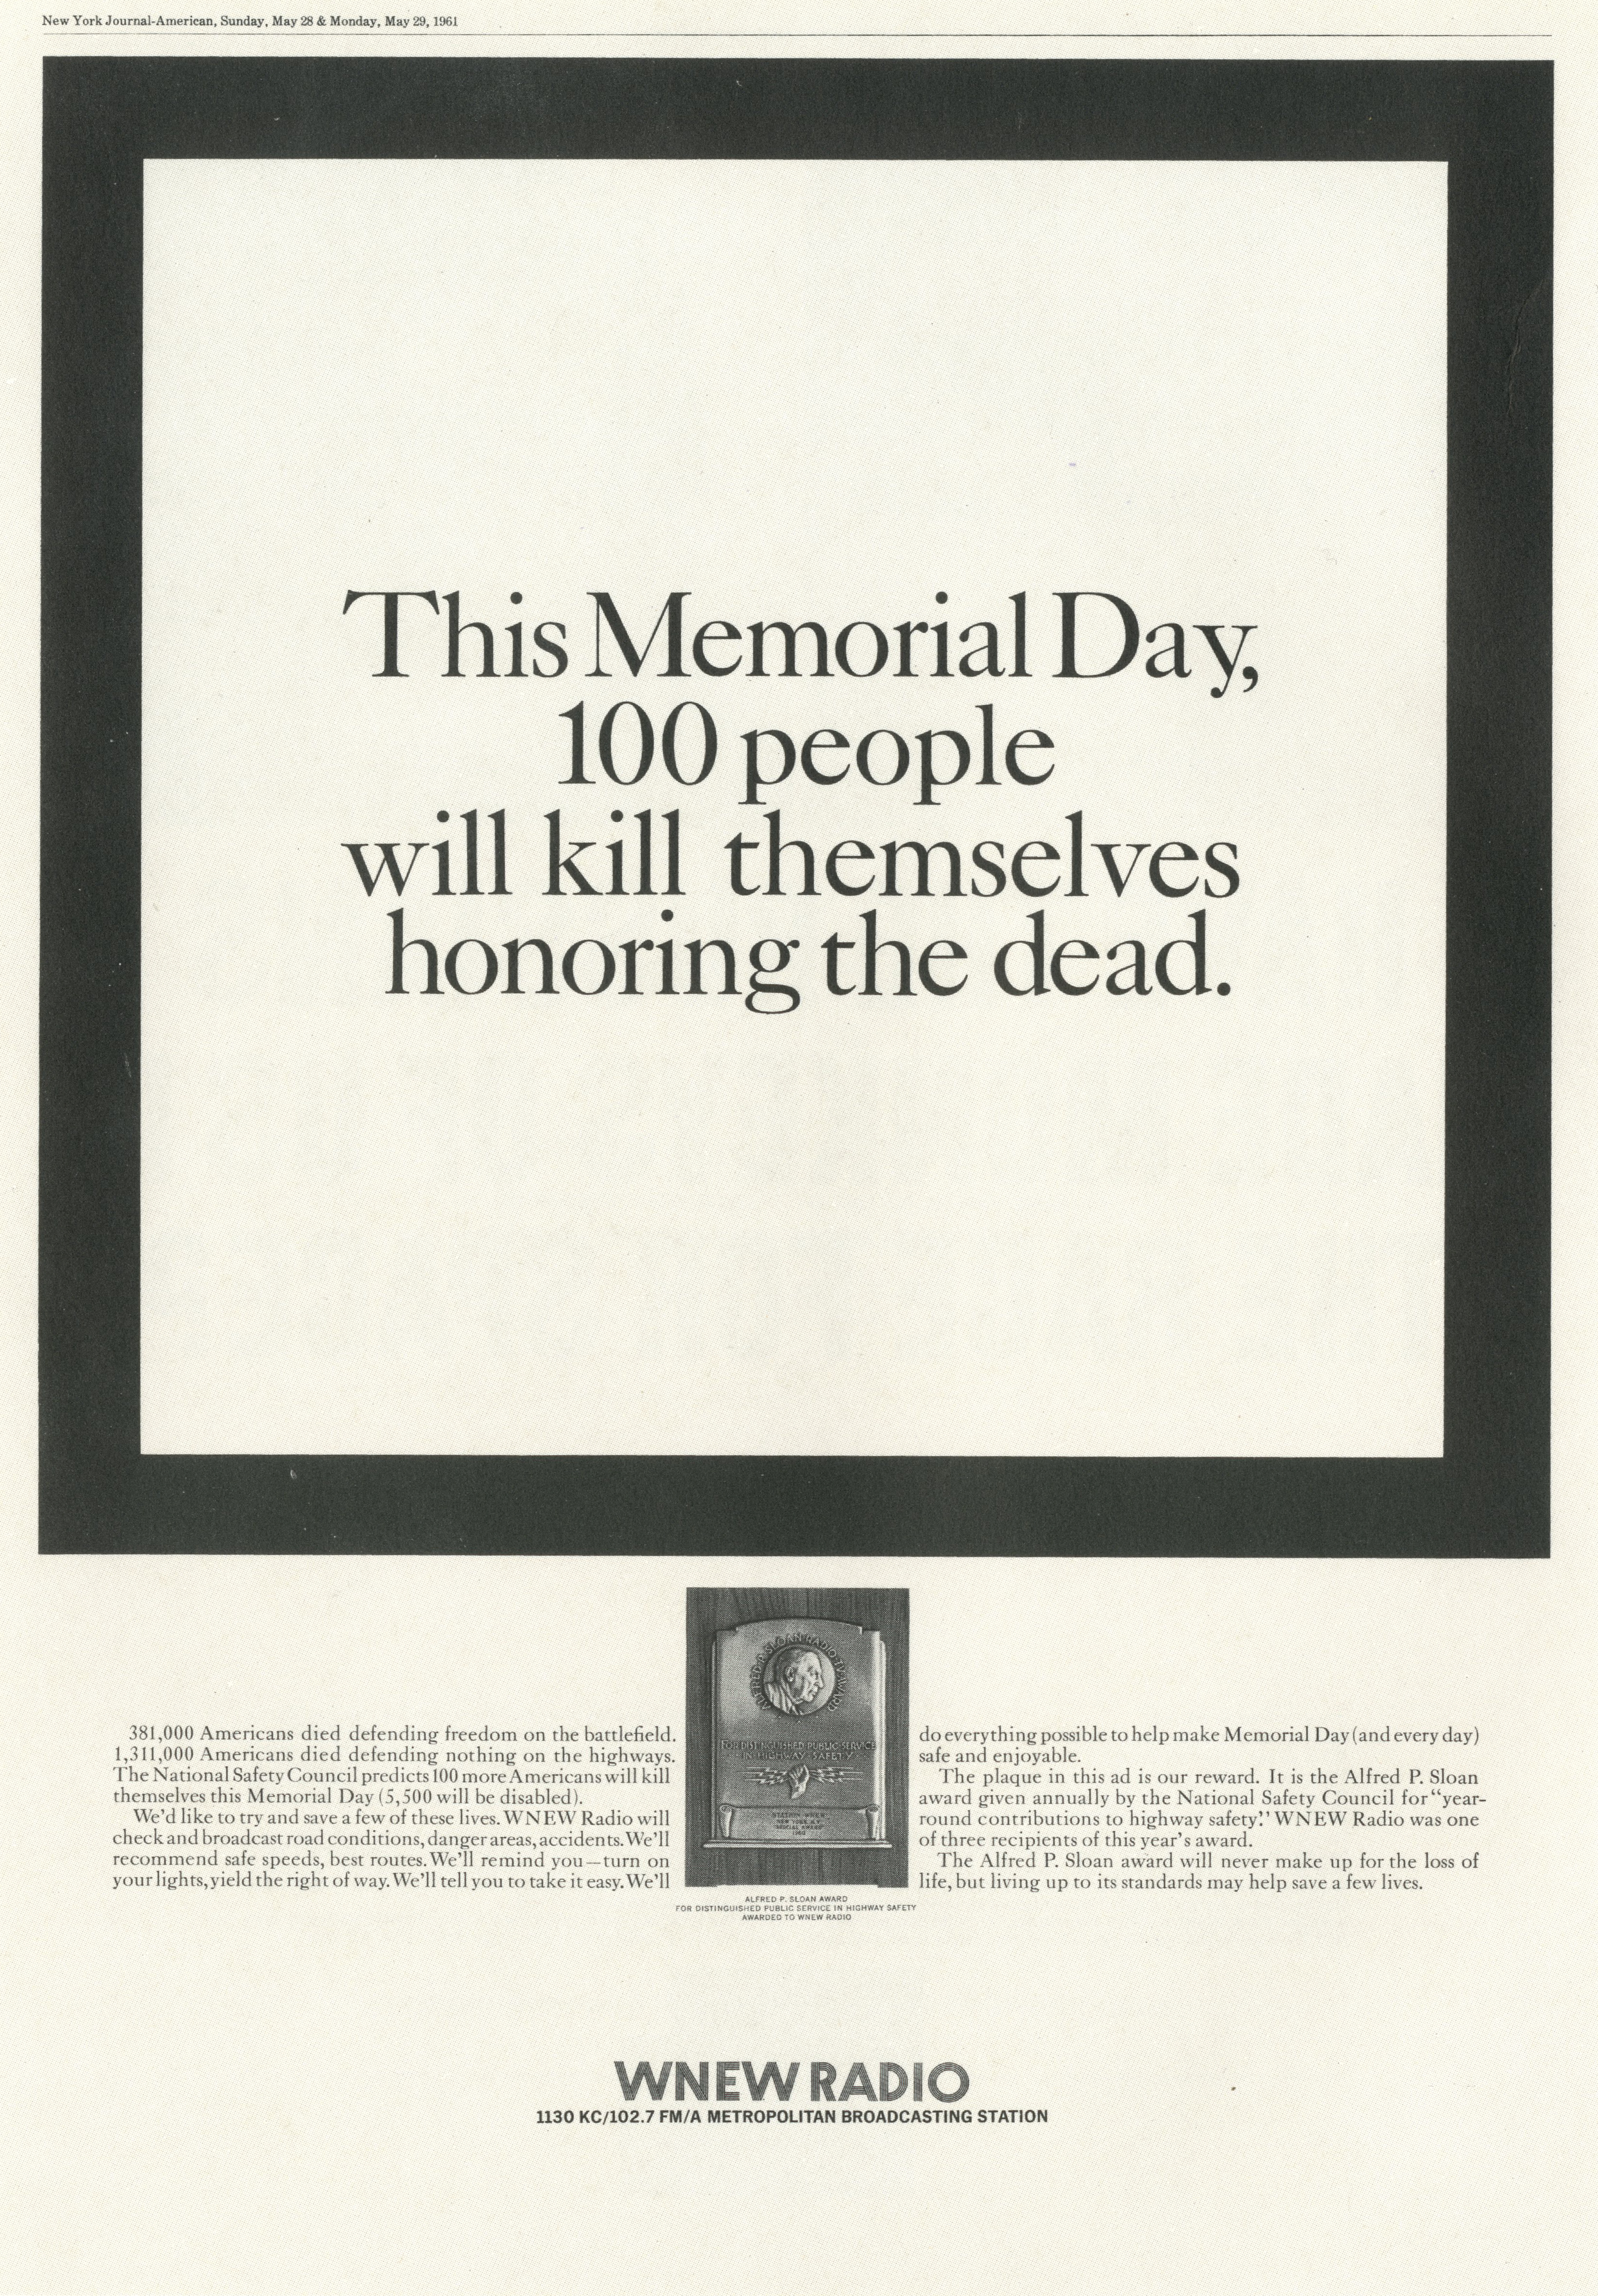 PKL2; WNEW Radio 'Memorial Day'-01